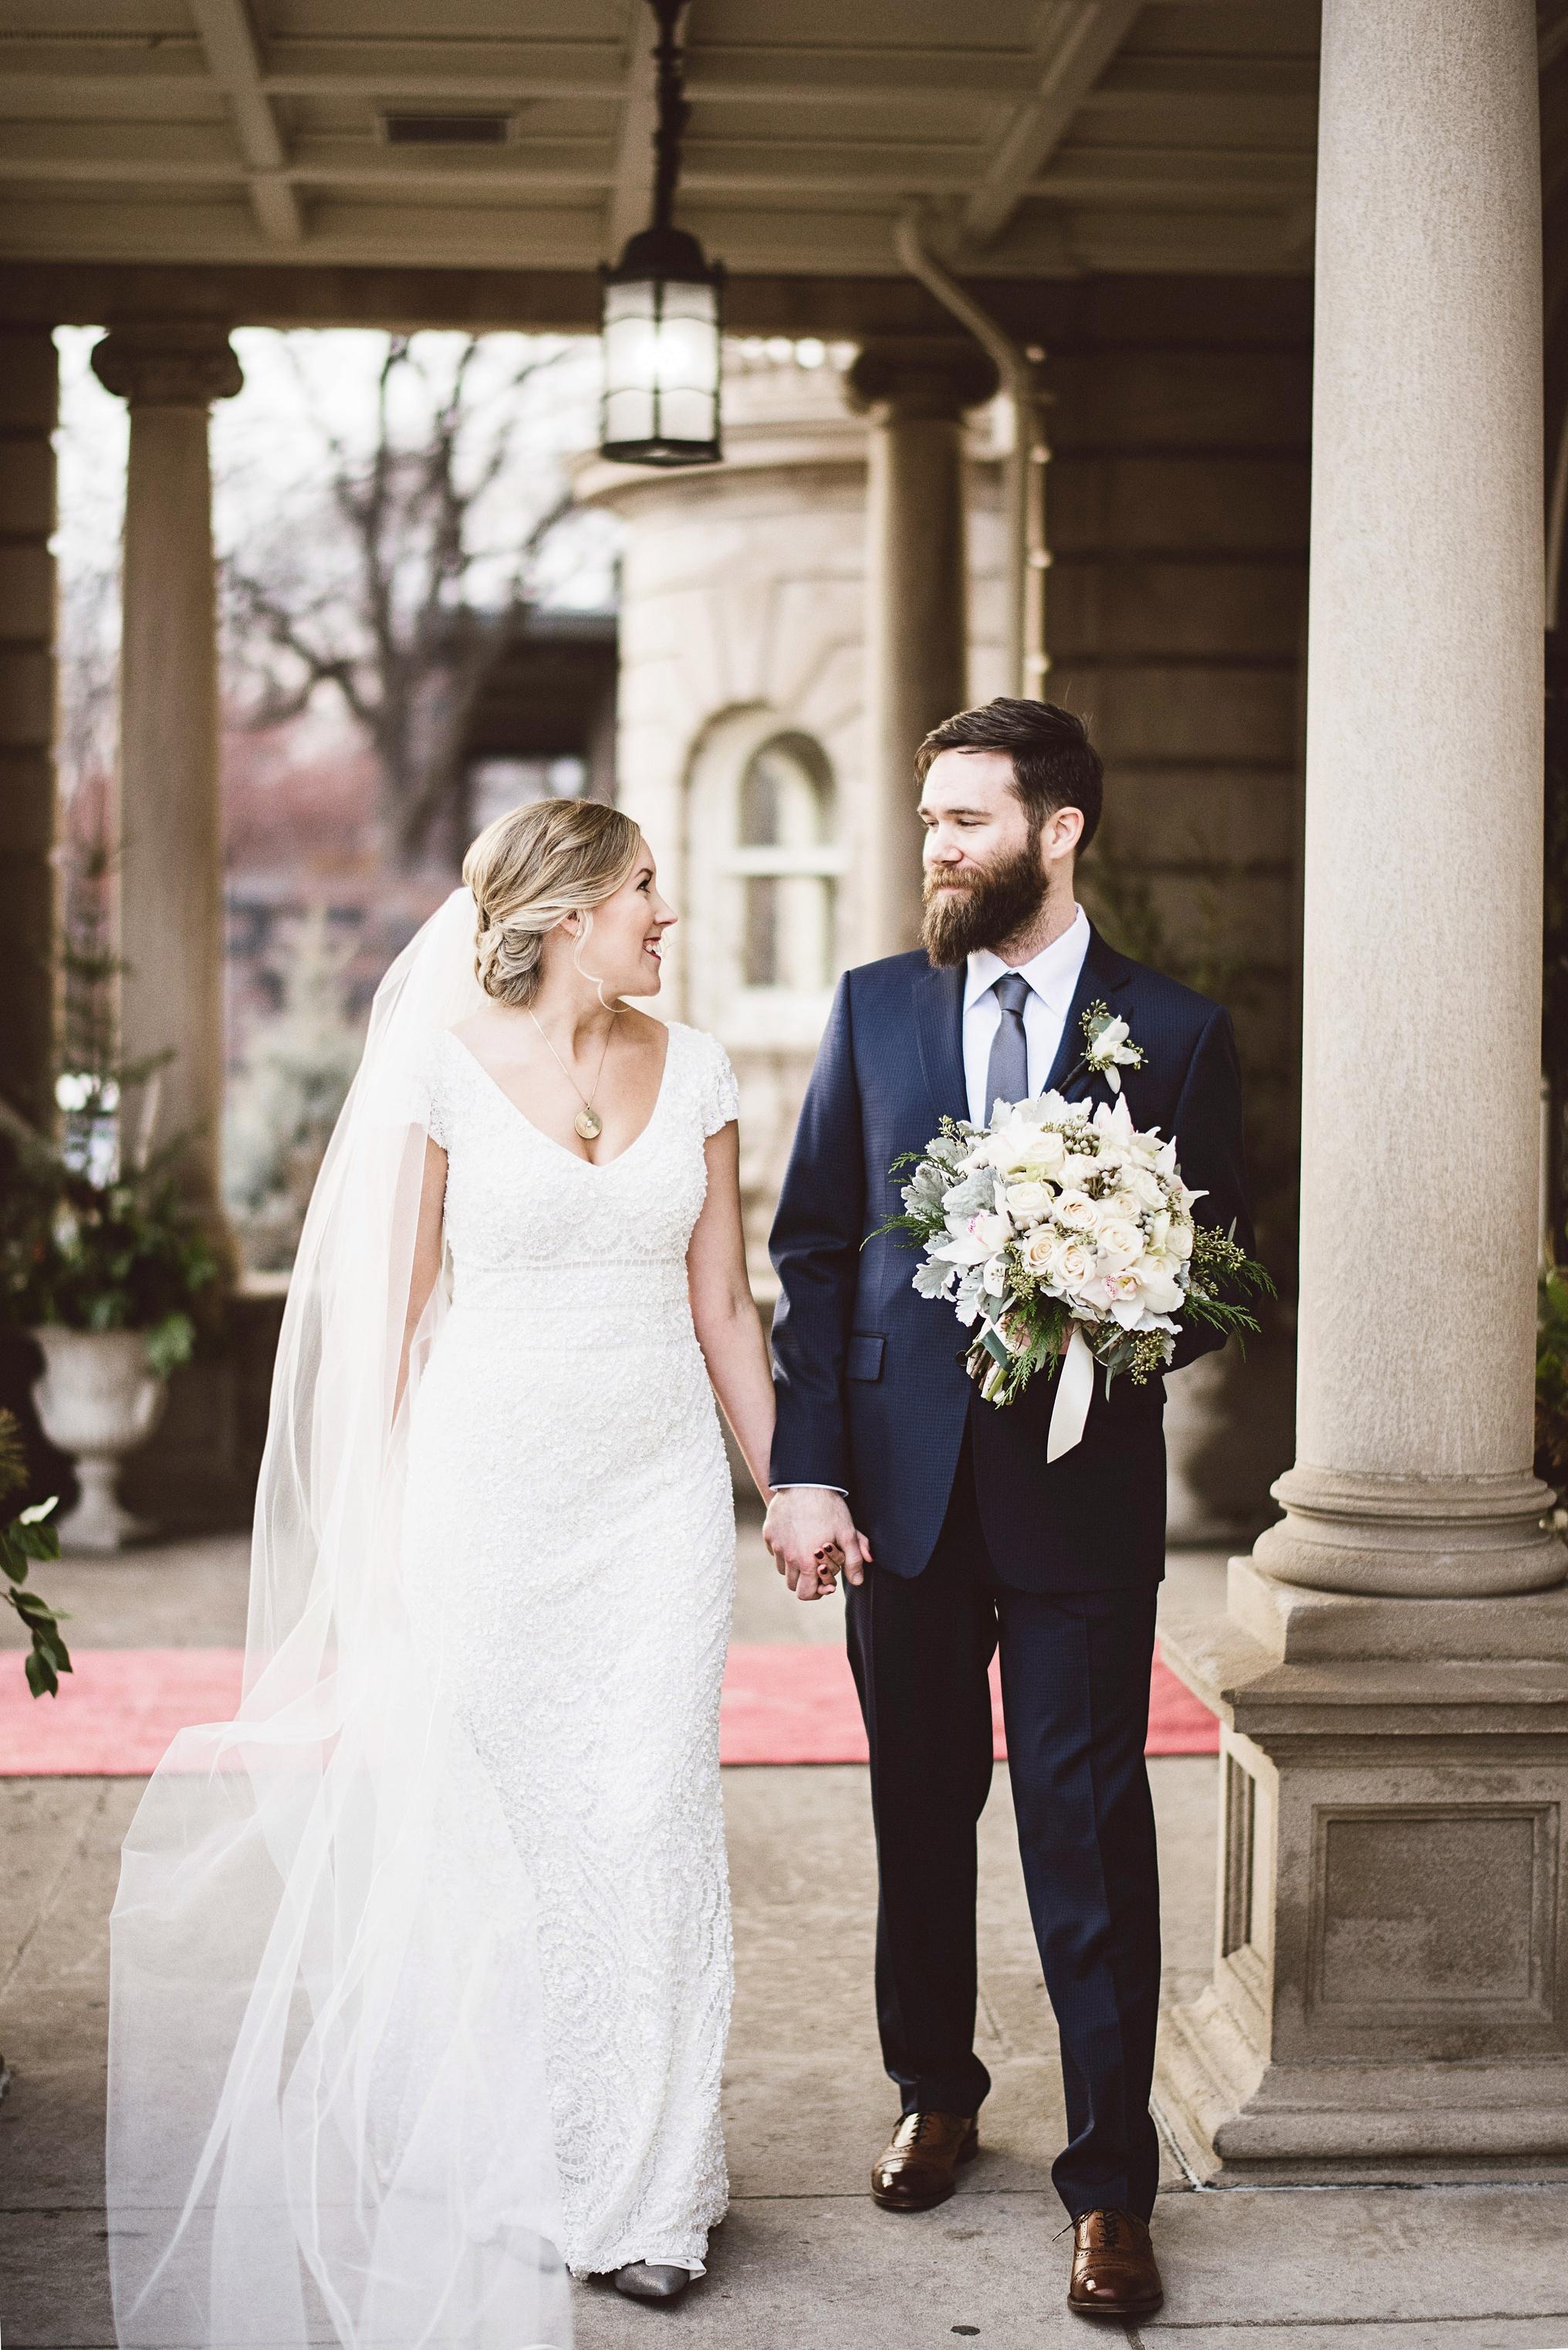 best_wedding_photography_2017_by_lucas_botz_photography_028.jpg